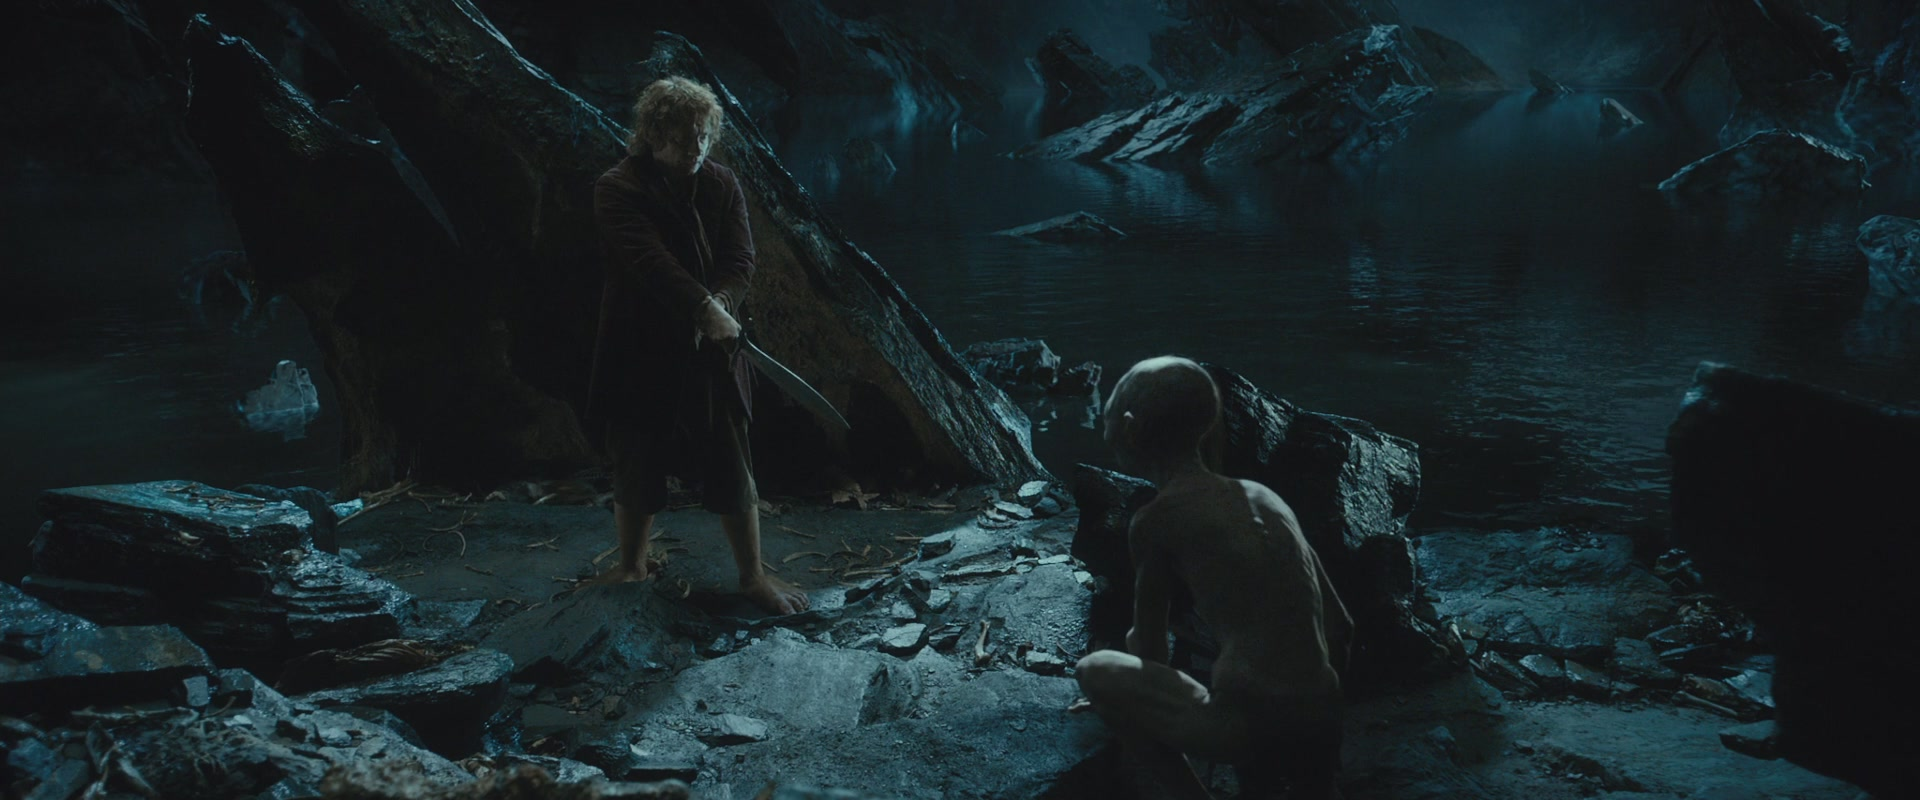 The hobbit bilbo and gollum